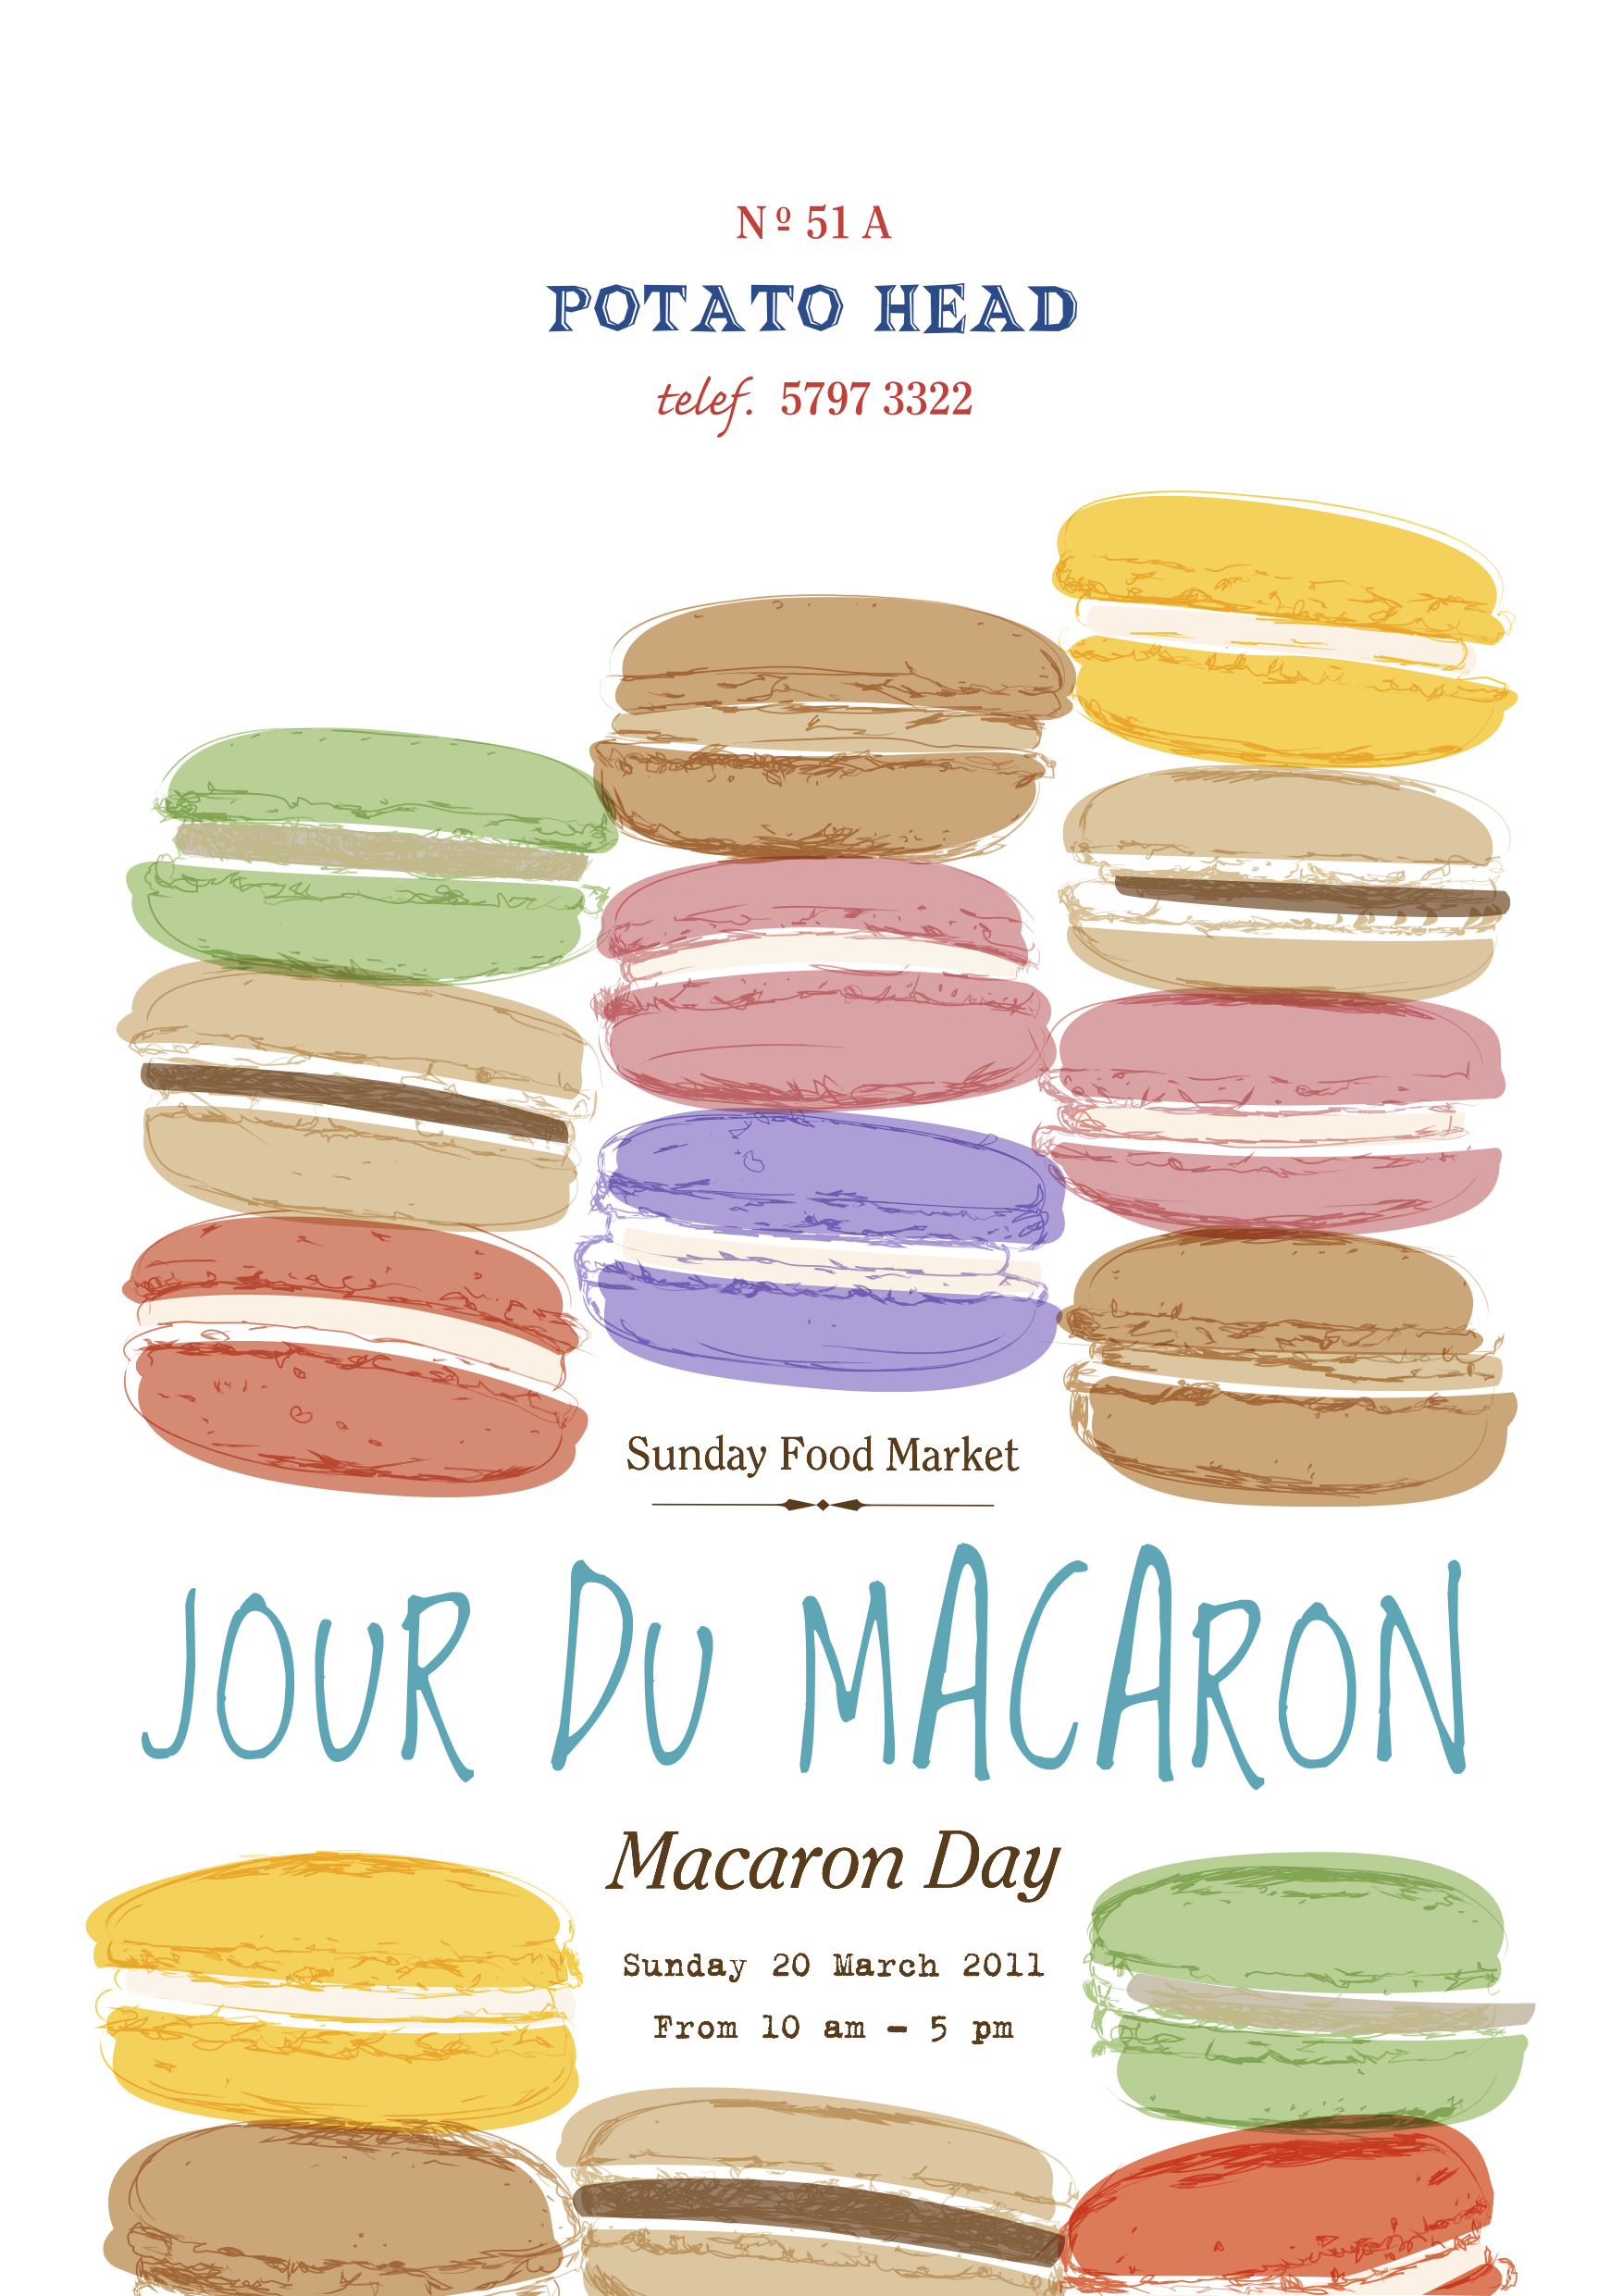 Sunday Food Market at Potato Head Jakarta- jour du Macaron- March 20th